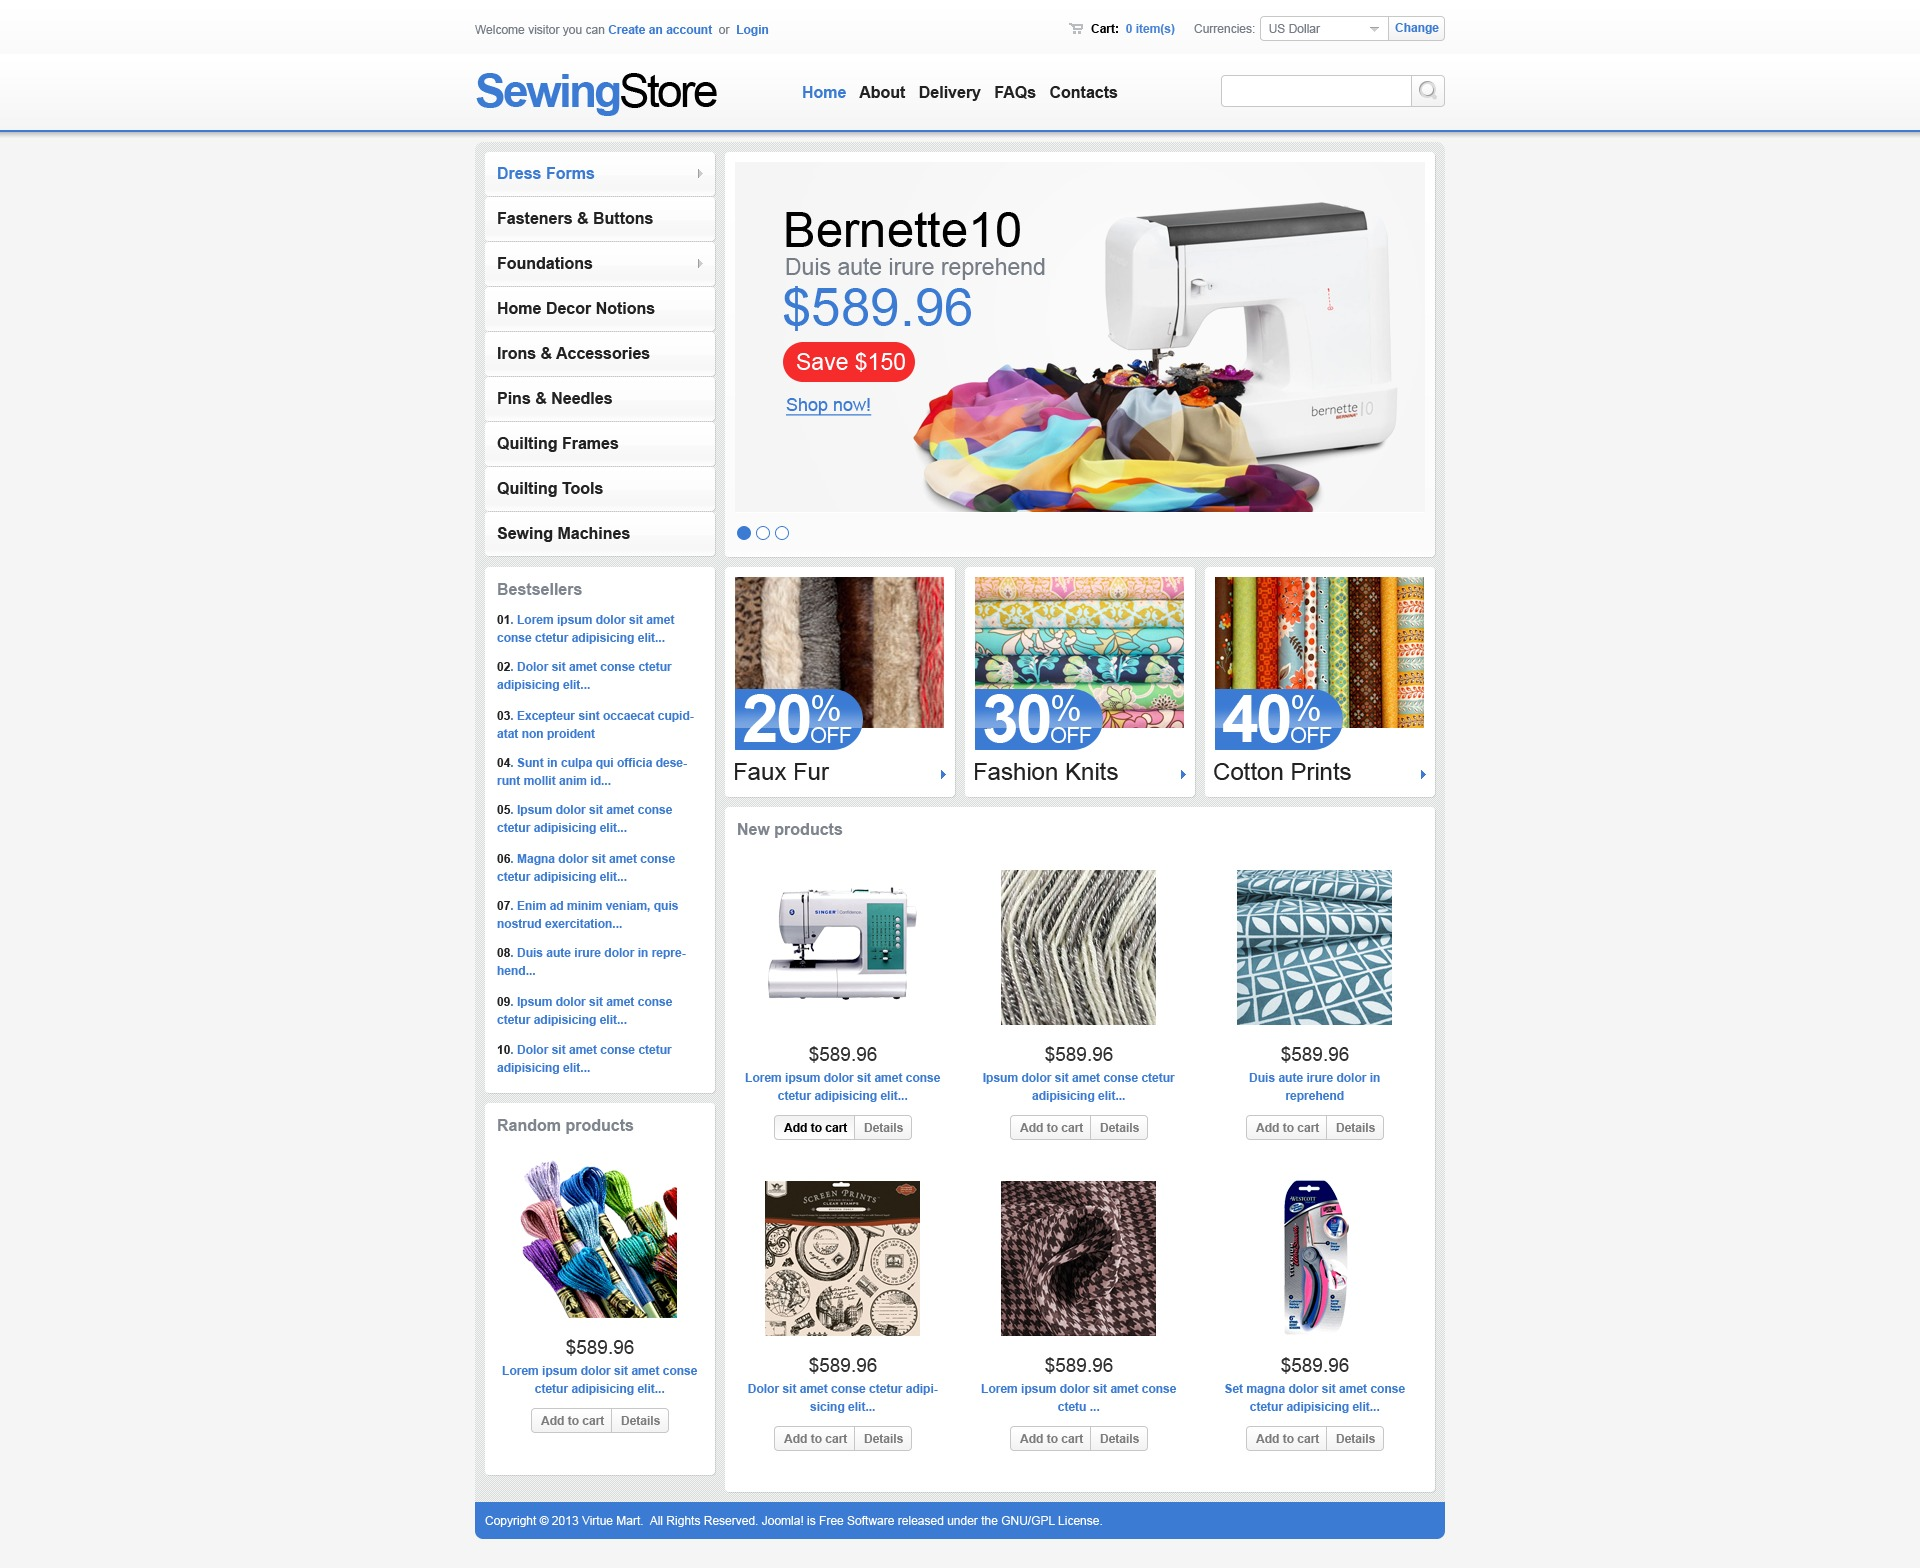 Sewing Store VirtueMart Template